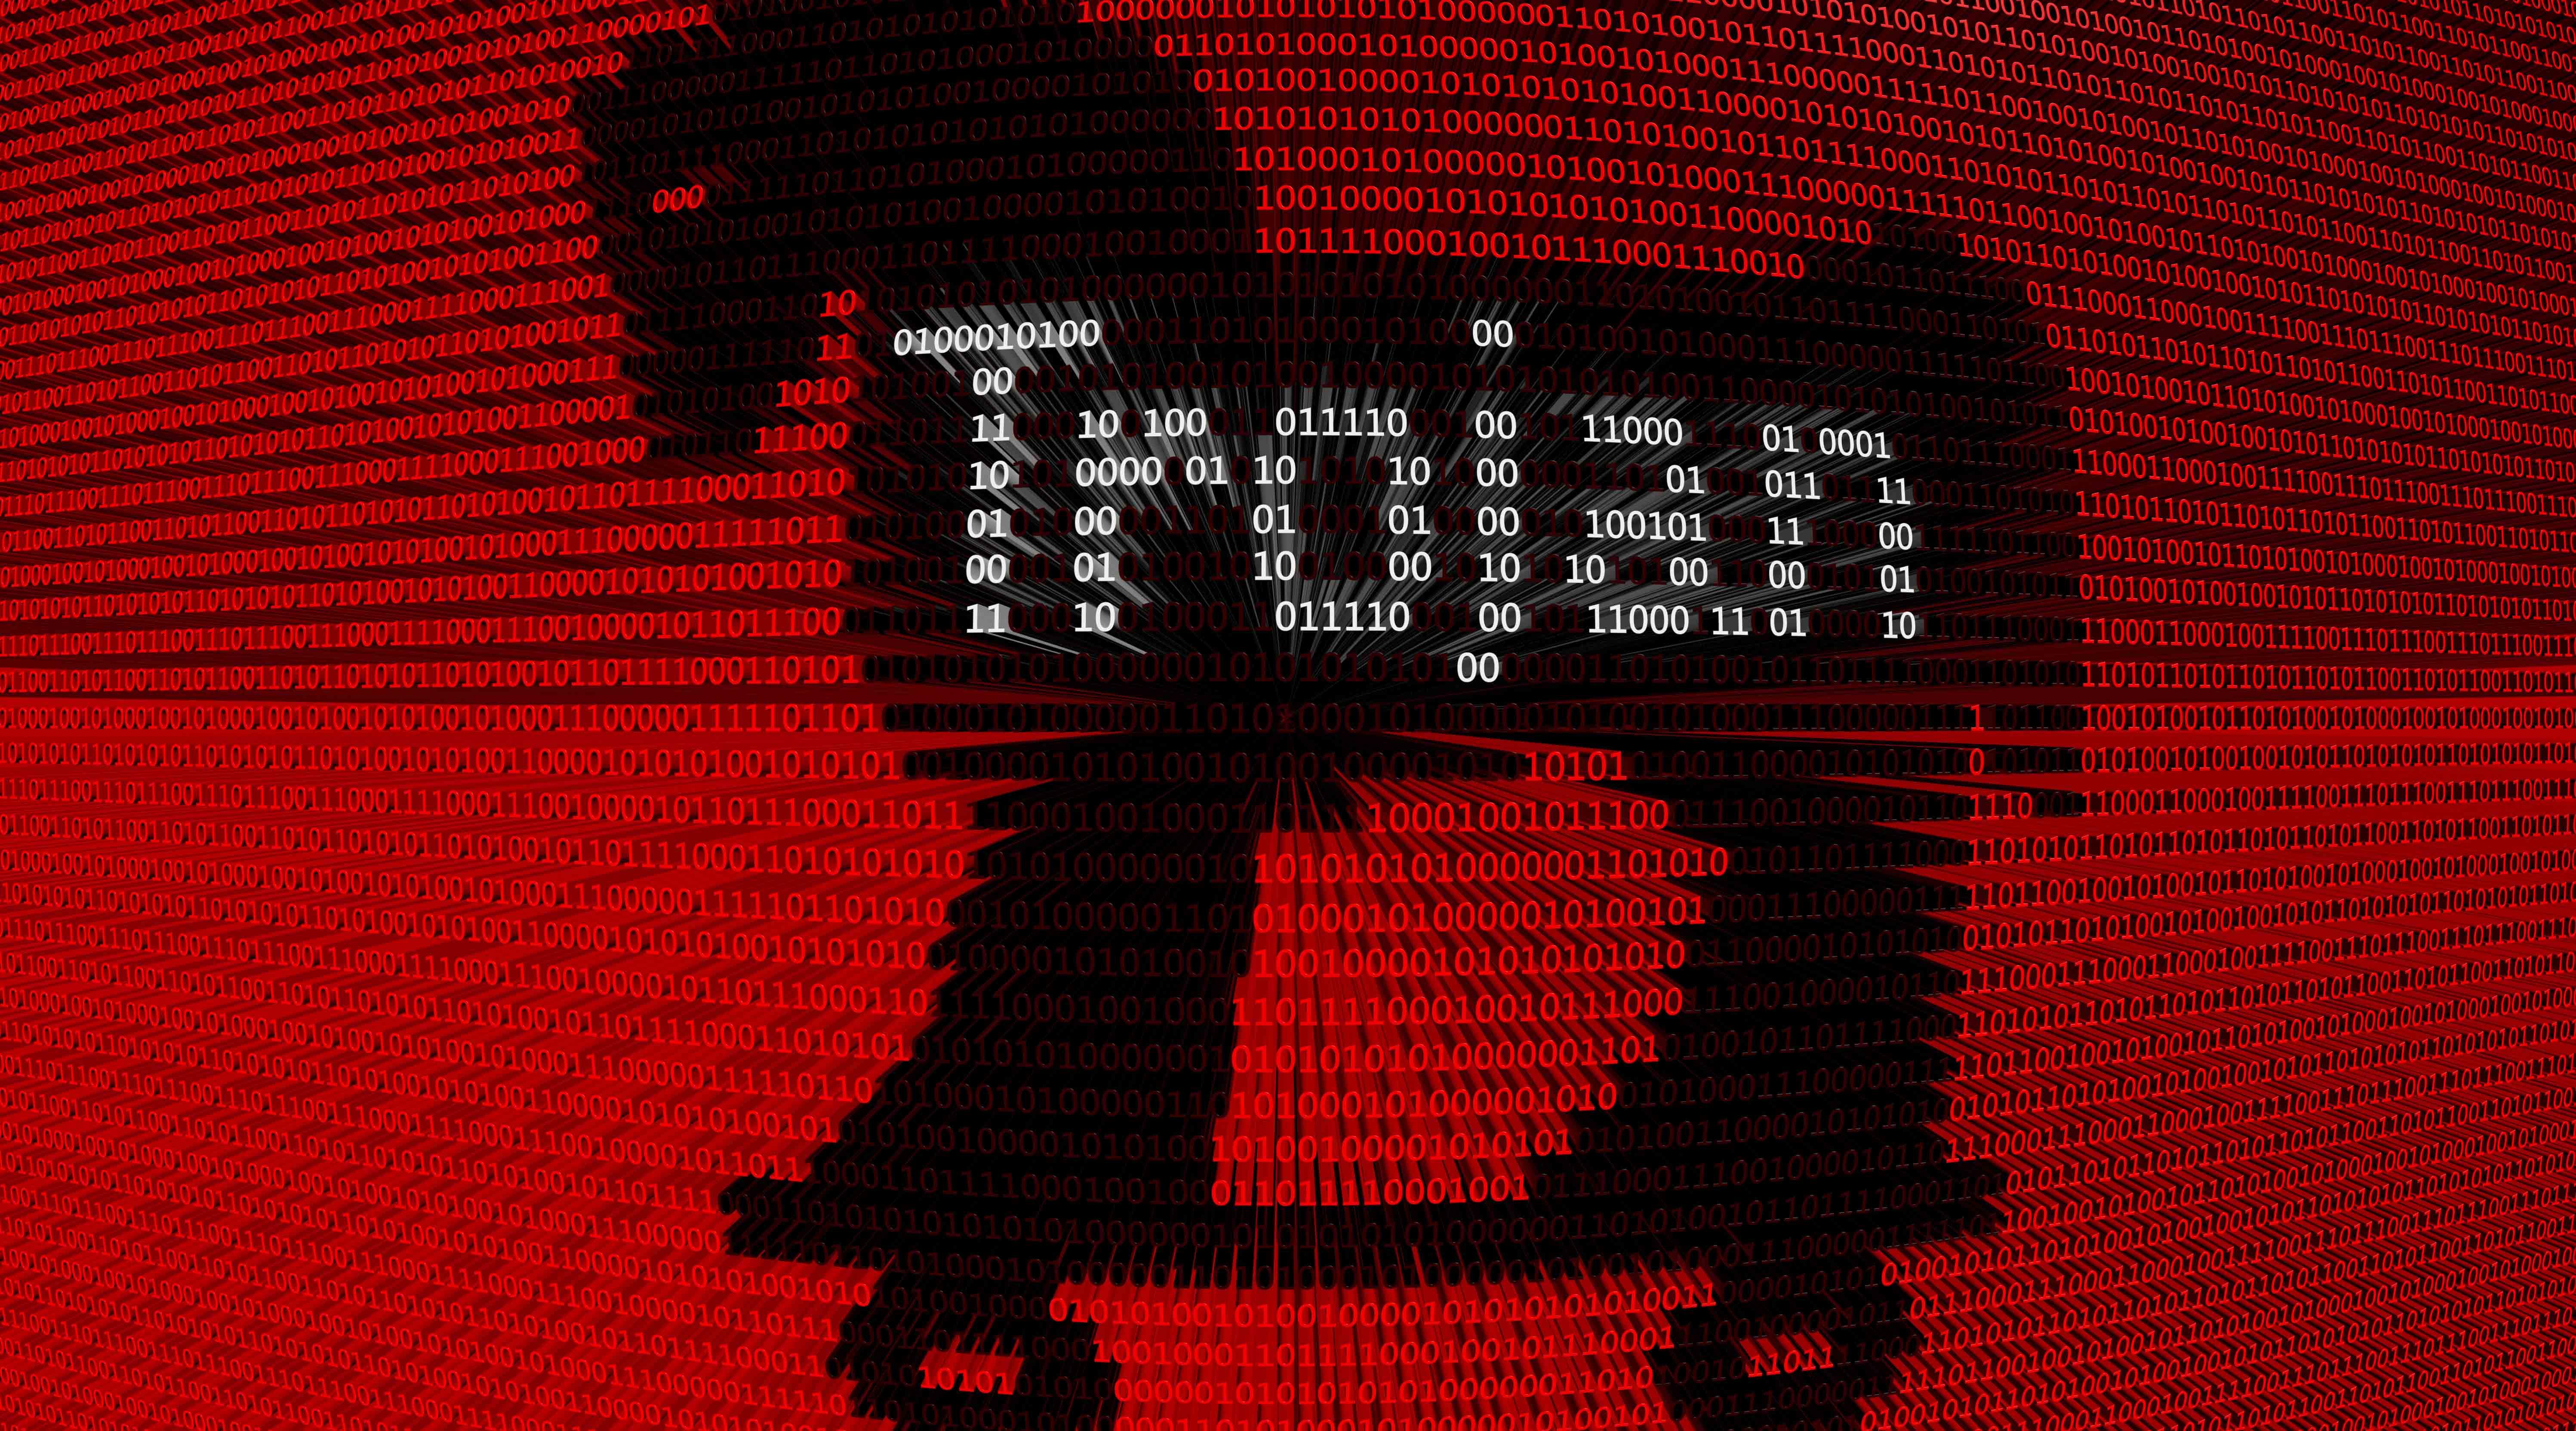 Ransomware, Trojaner, Darknet